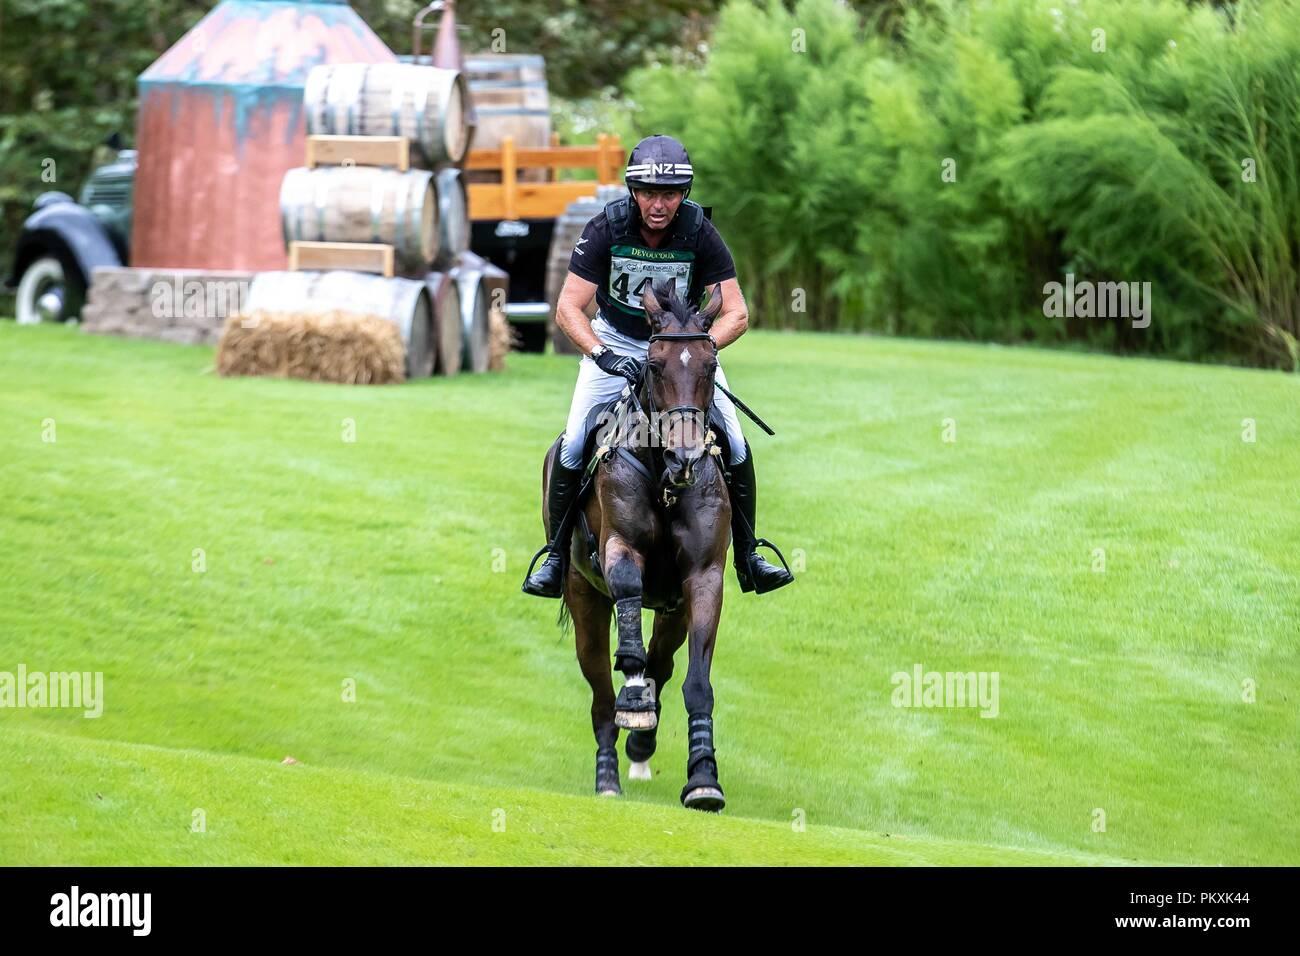 North Carolina, USA. 15th Sept 2018. Daniel Jocelyn. Grovine de Reve. NZL. Eventing Cross country Day 5. World Equestrian Games. WEG 2018 Tryon. North Carolina. USA. 15/09/2018. Credit: Sport In Pictures/Alamy Live News Stock Photo